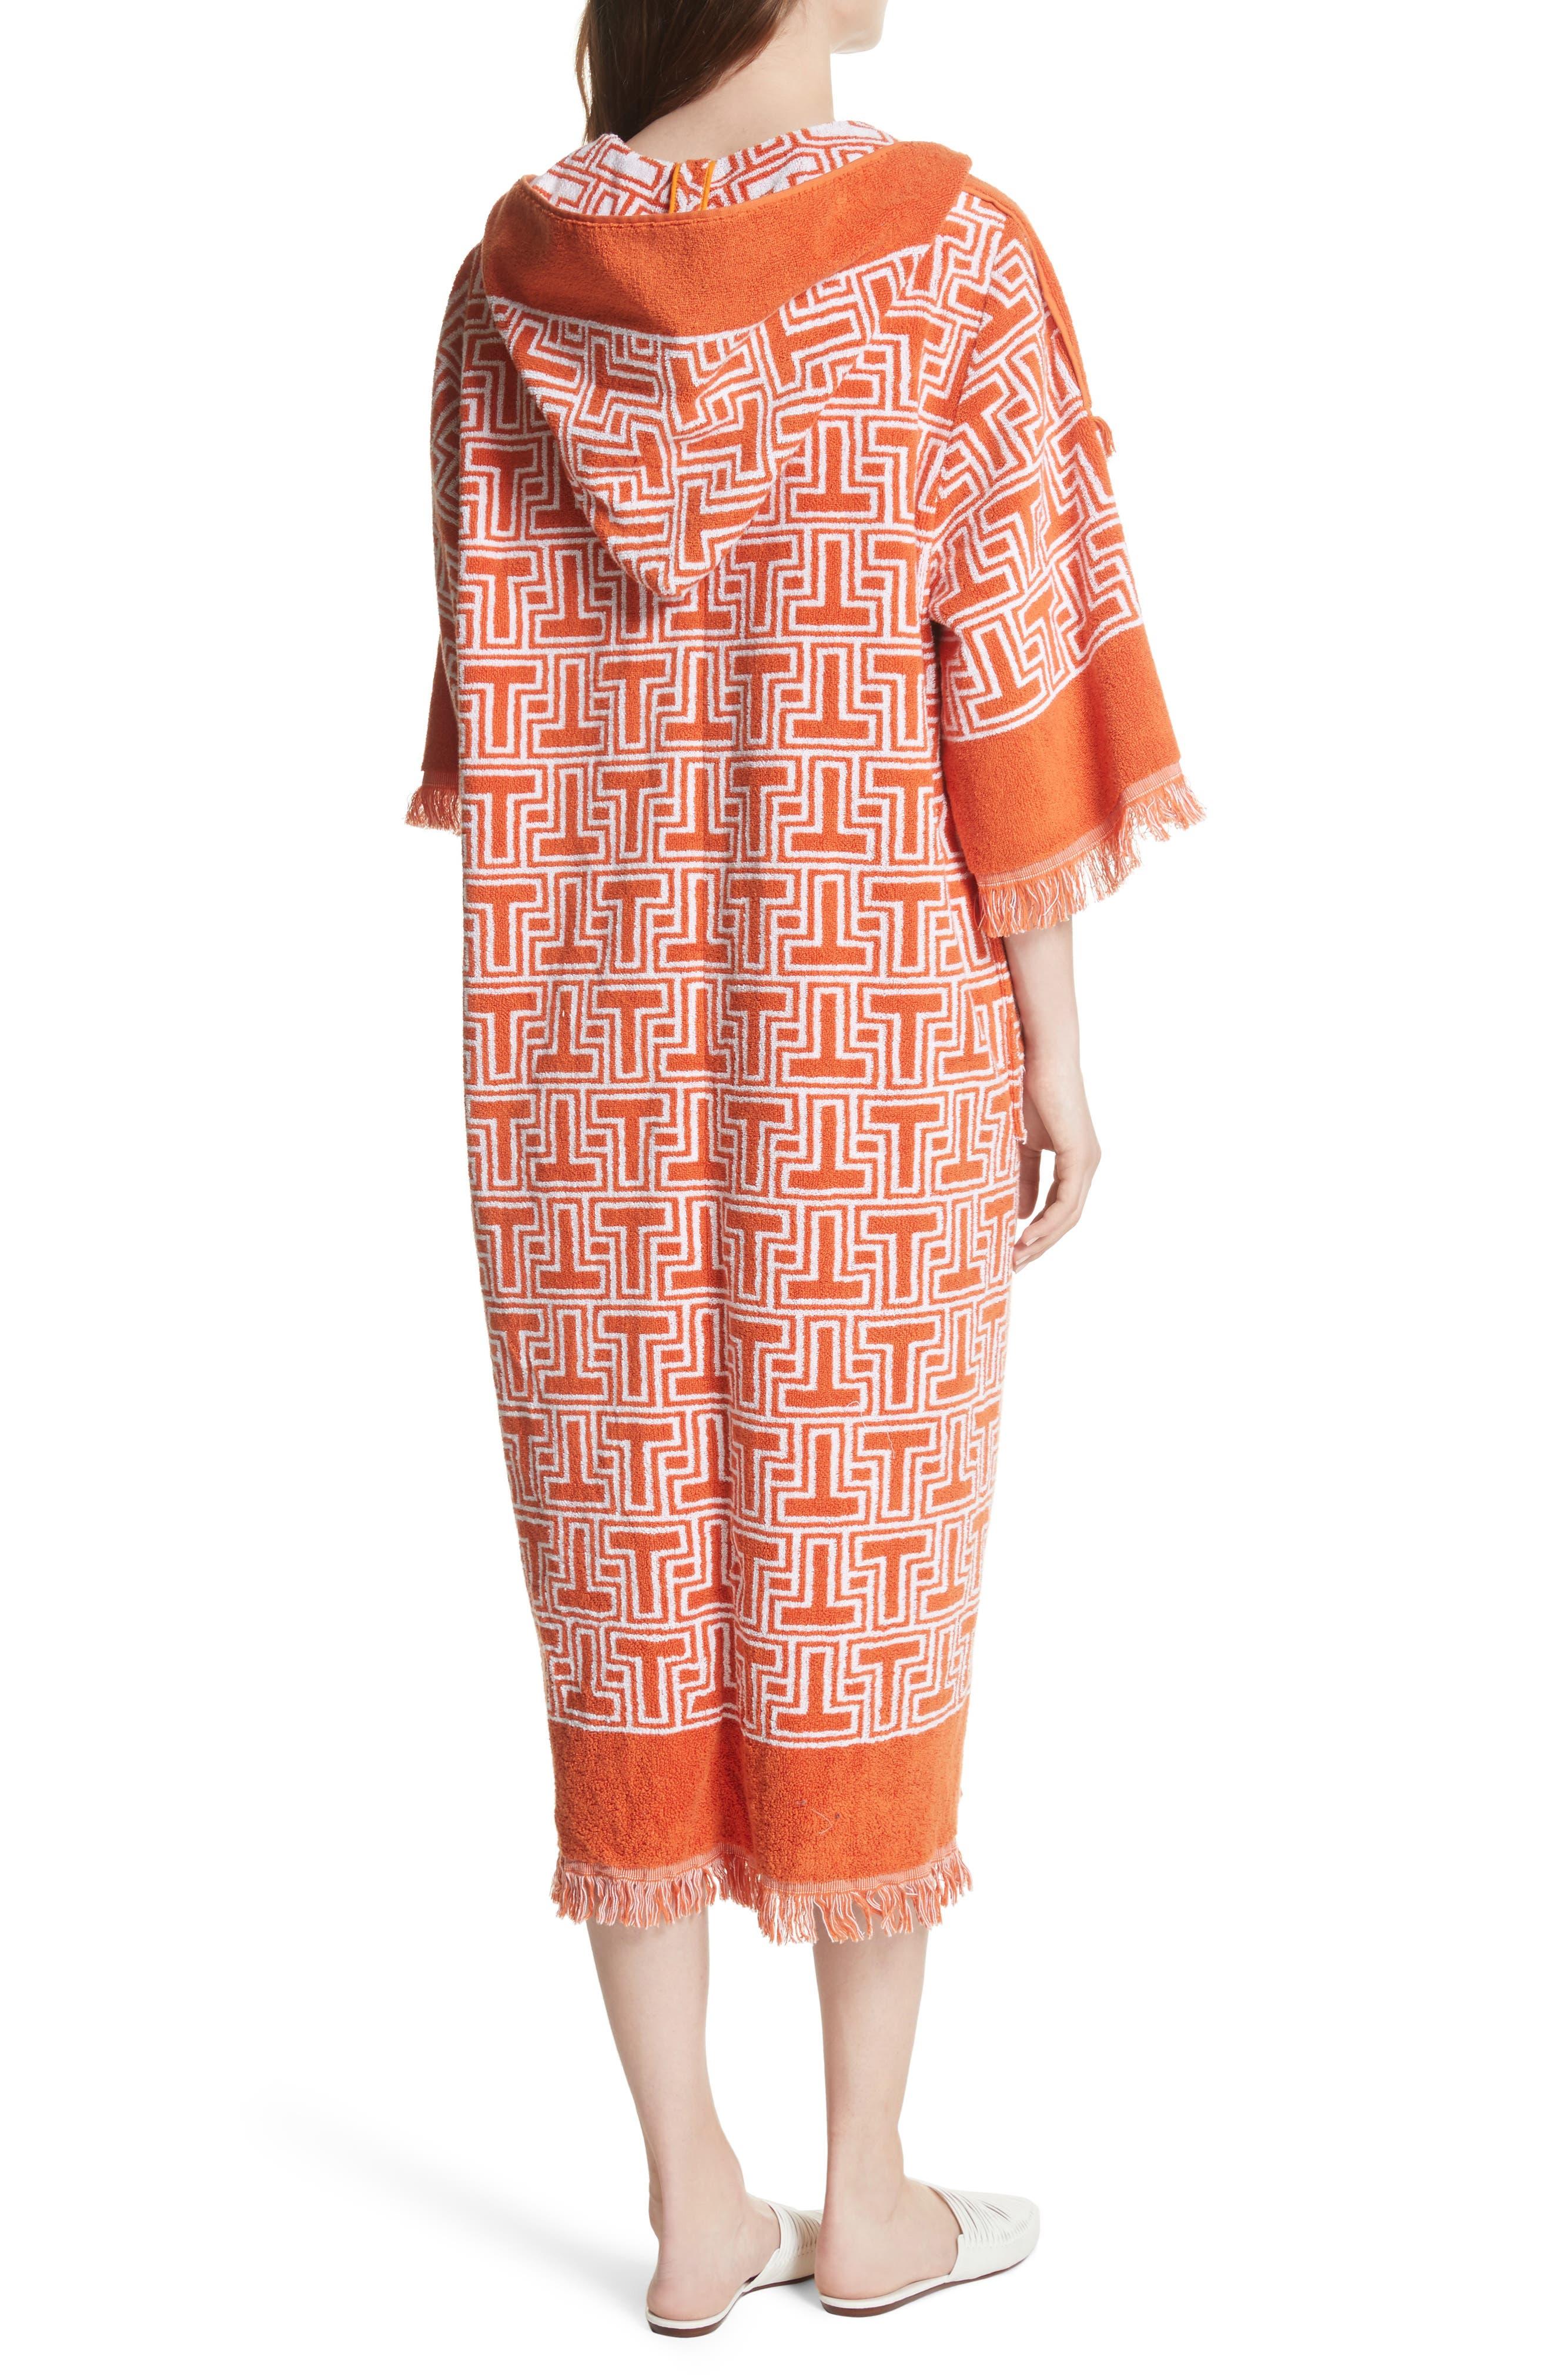 Tile T Terry Coat,                             Alternate thumbnail 2, color,                             Orange Towel Jacquard